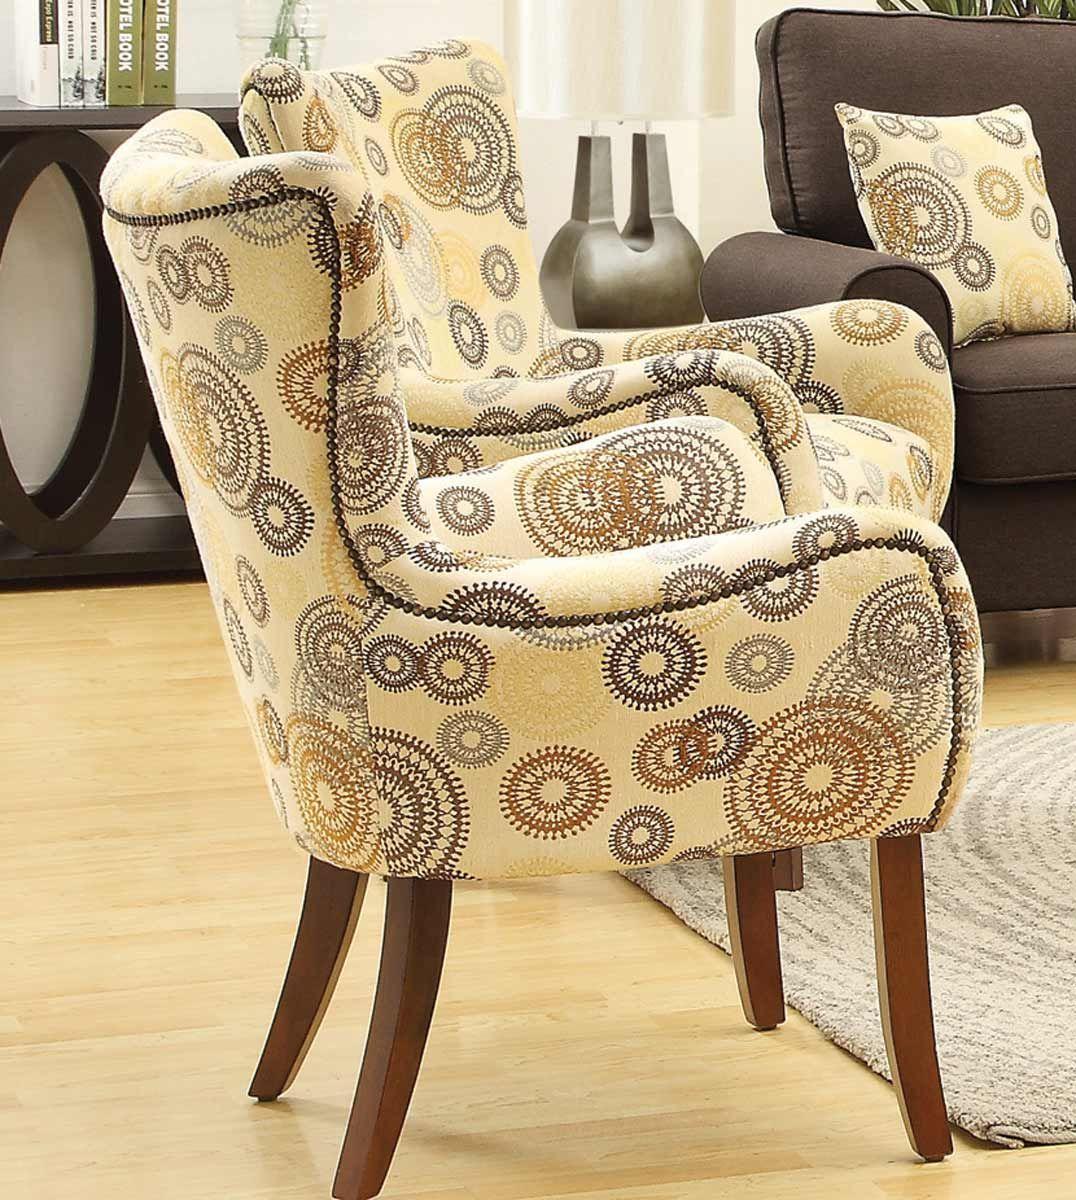 Prime Coaster 902052 Accent Chair Corner Chairs Accent Chairs Machost Co Dining Chair Design Ideas Machostcouk